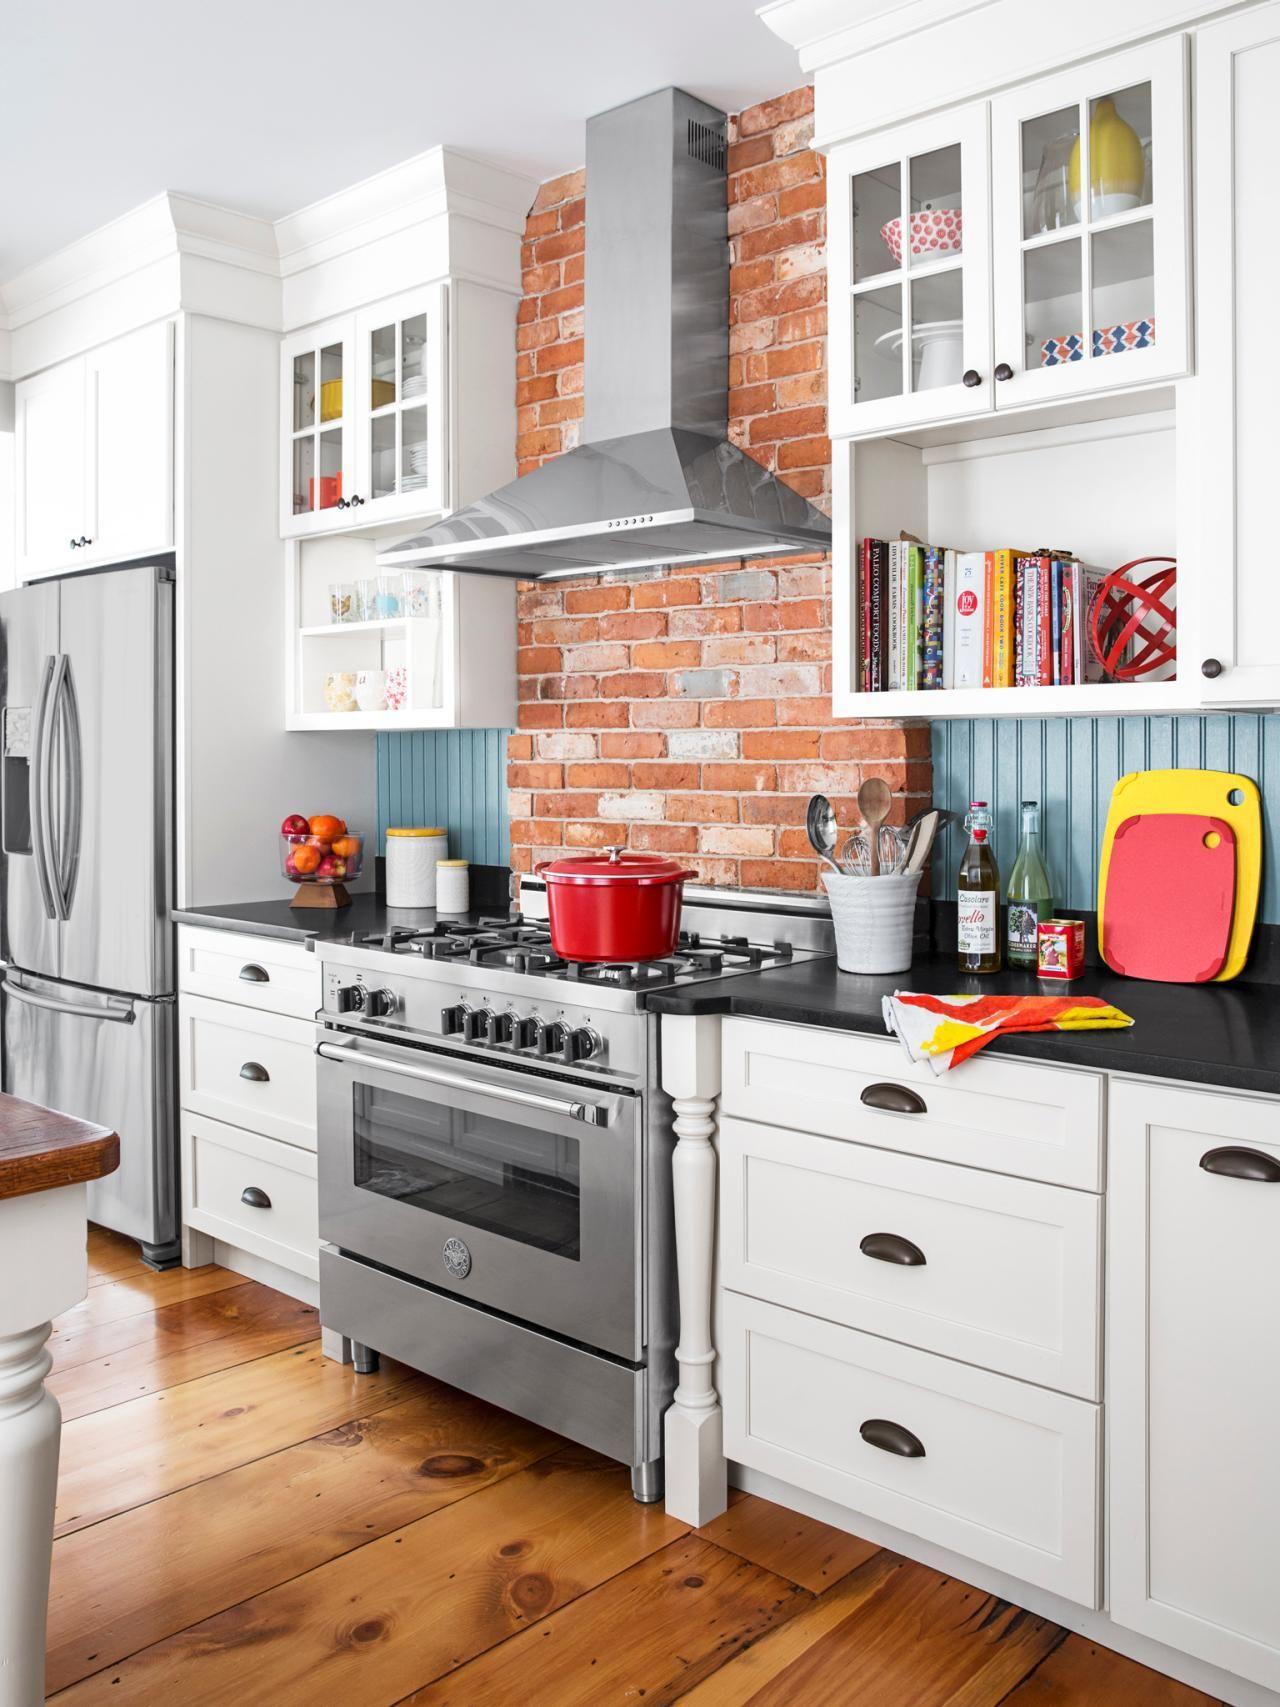 The New 170 Year Old Kitchen Kitchen Design Kitchen Backsplash Inspiration Stylish Kitchen